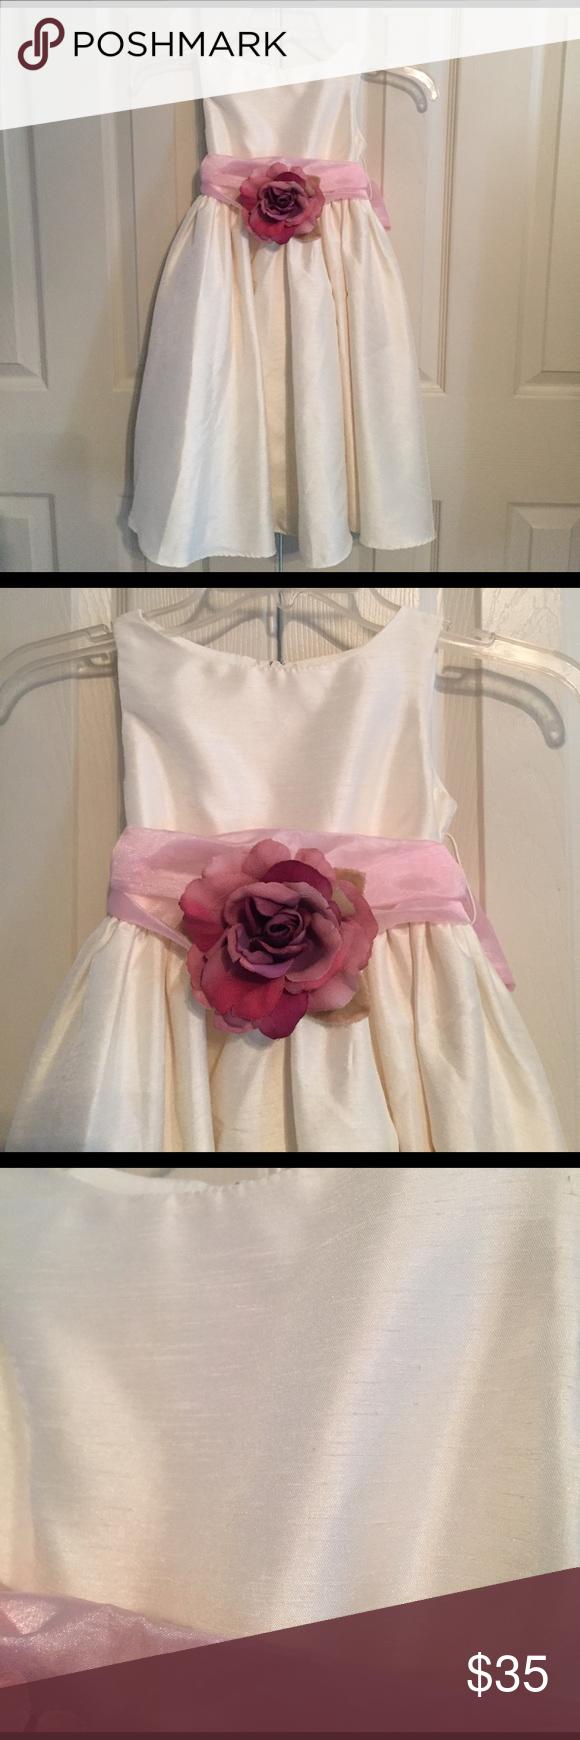 Kids dream pink rose dress kids dream pink rose dress size in